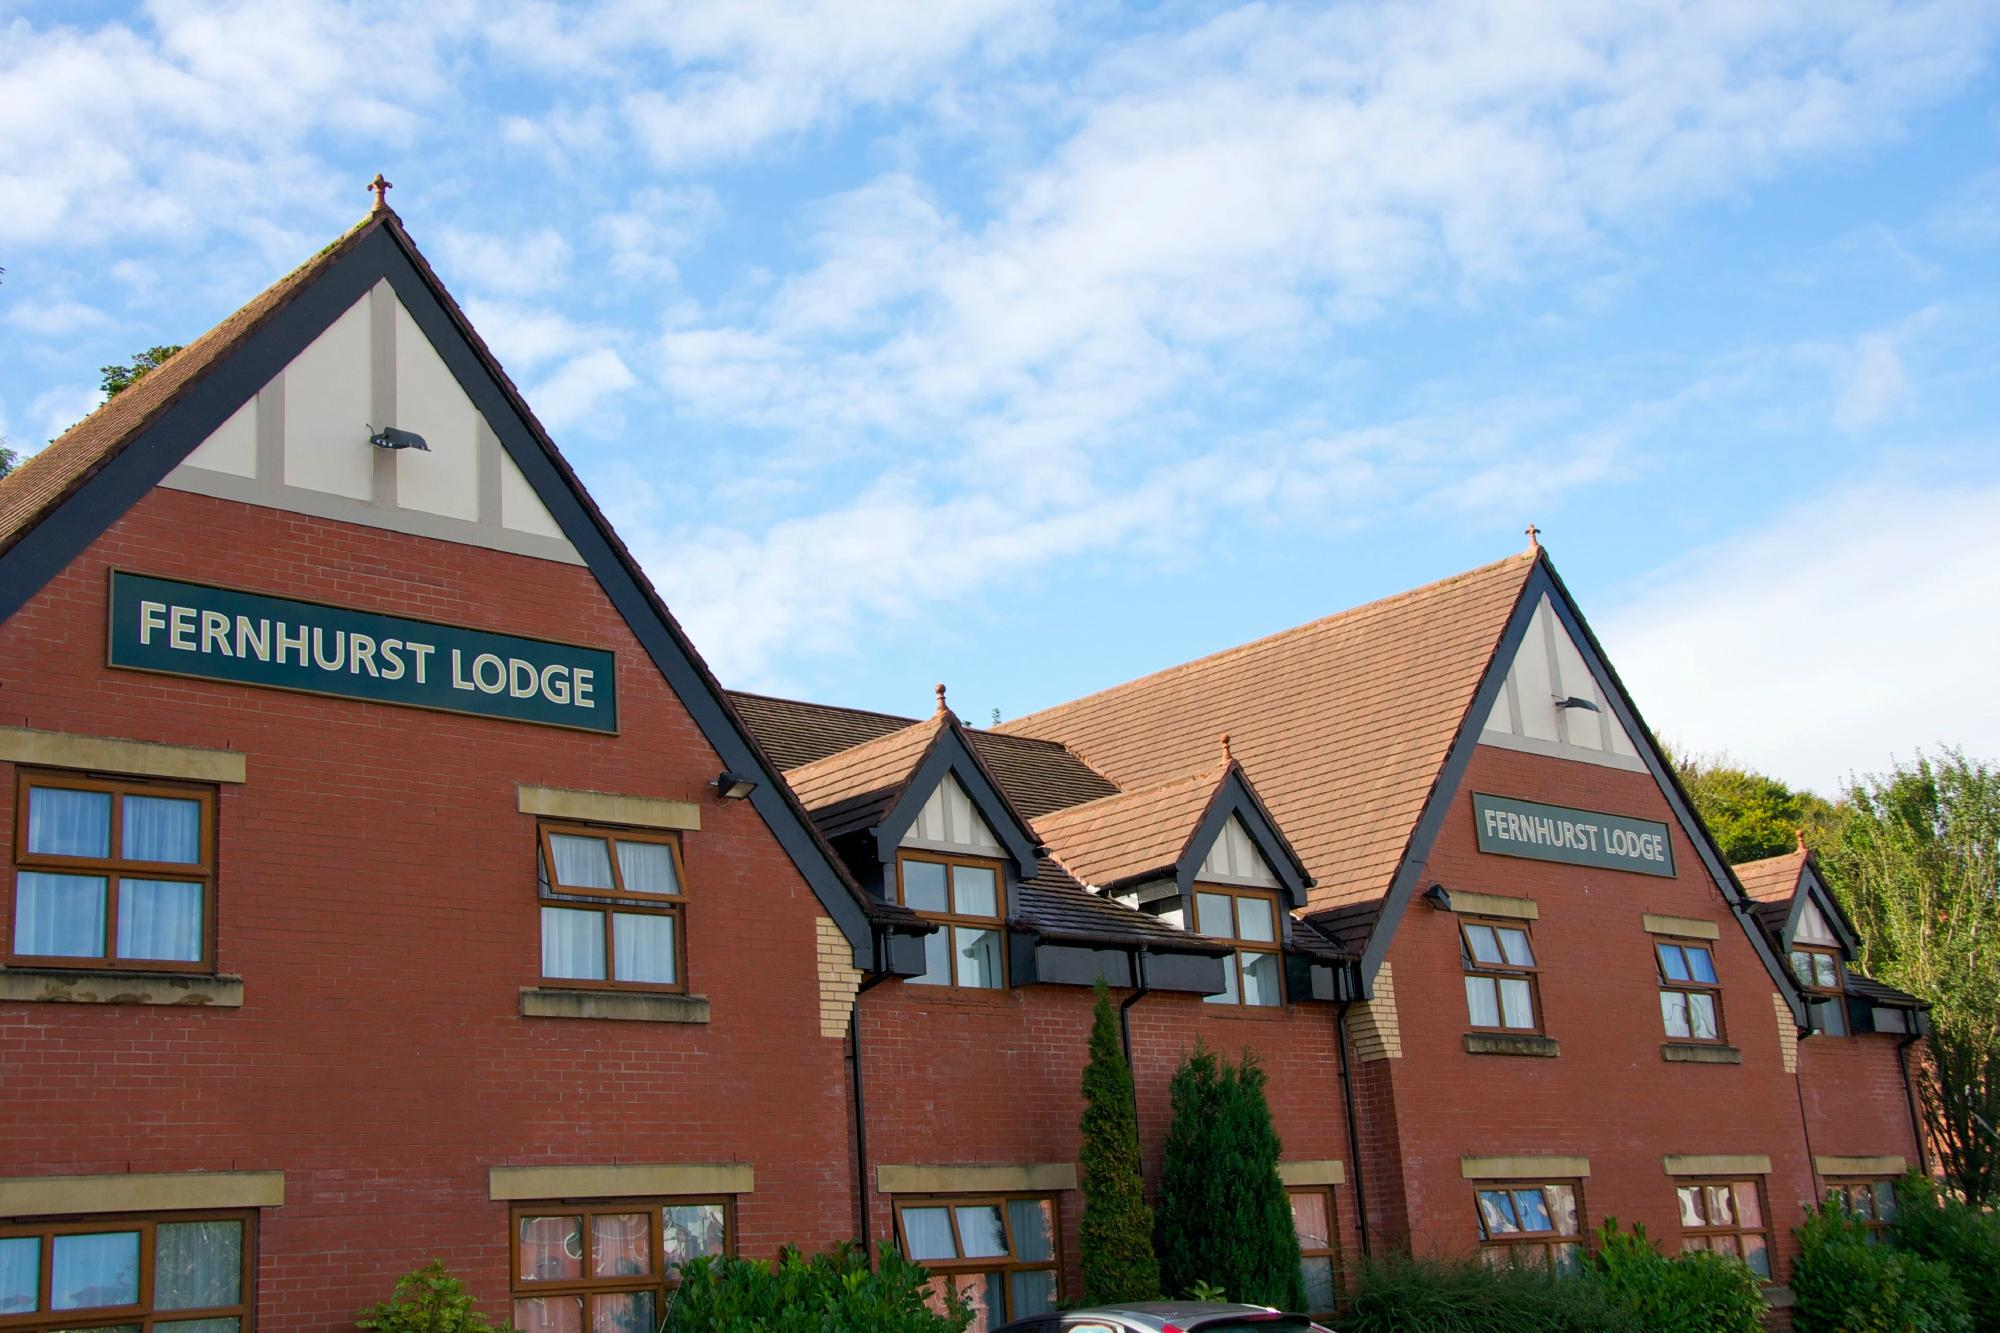 Fernhurst Lodge